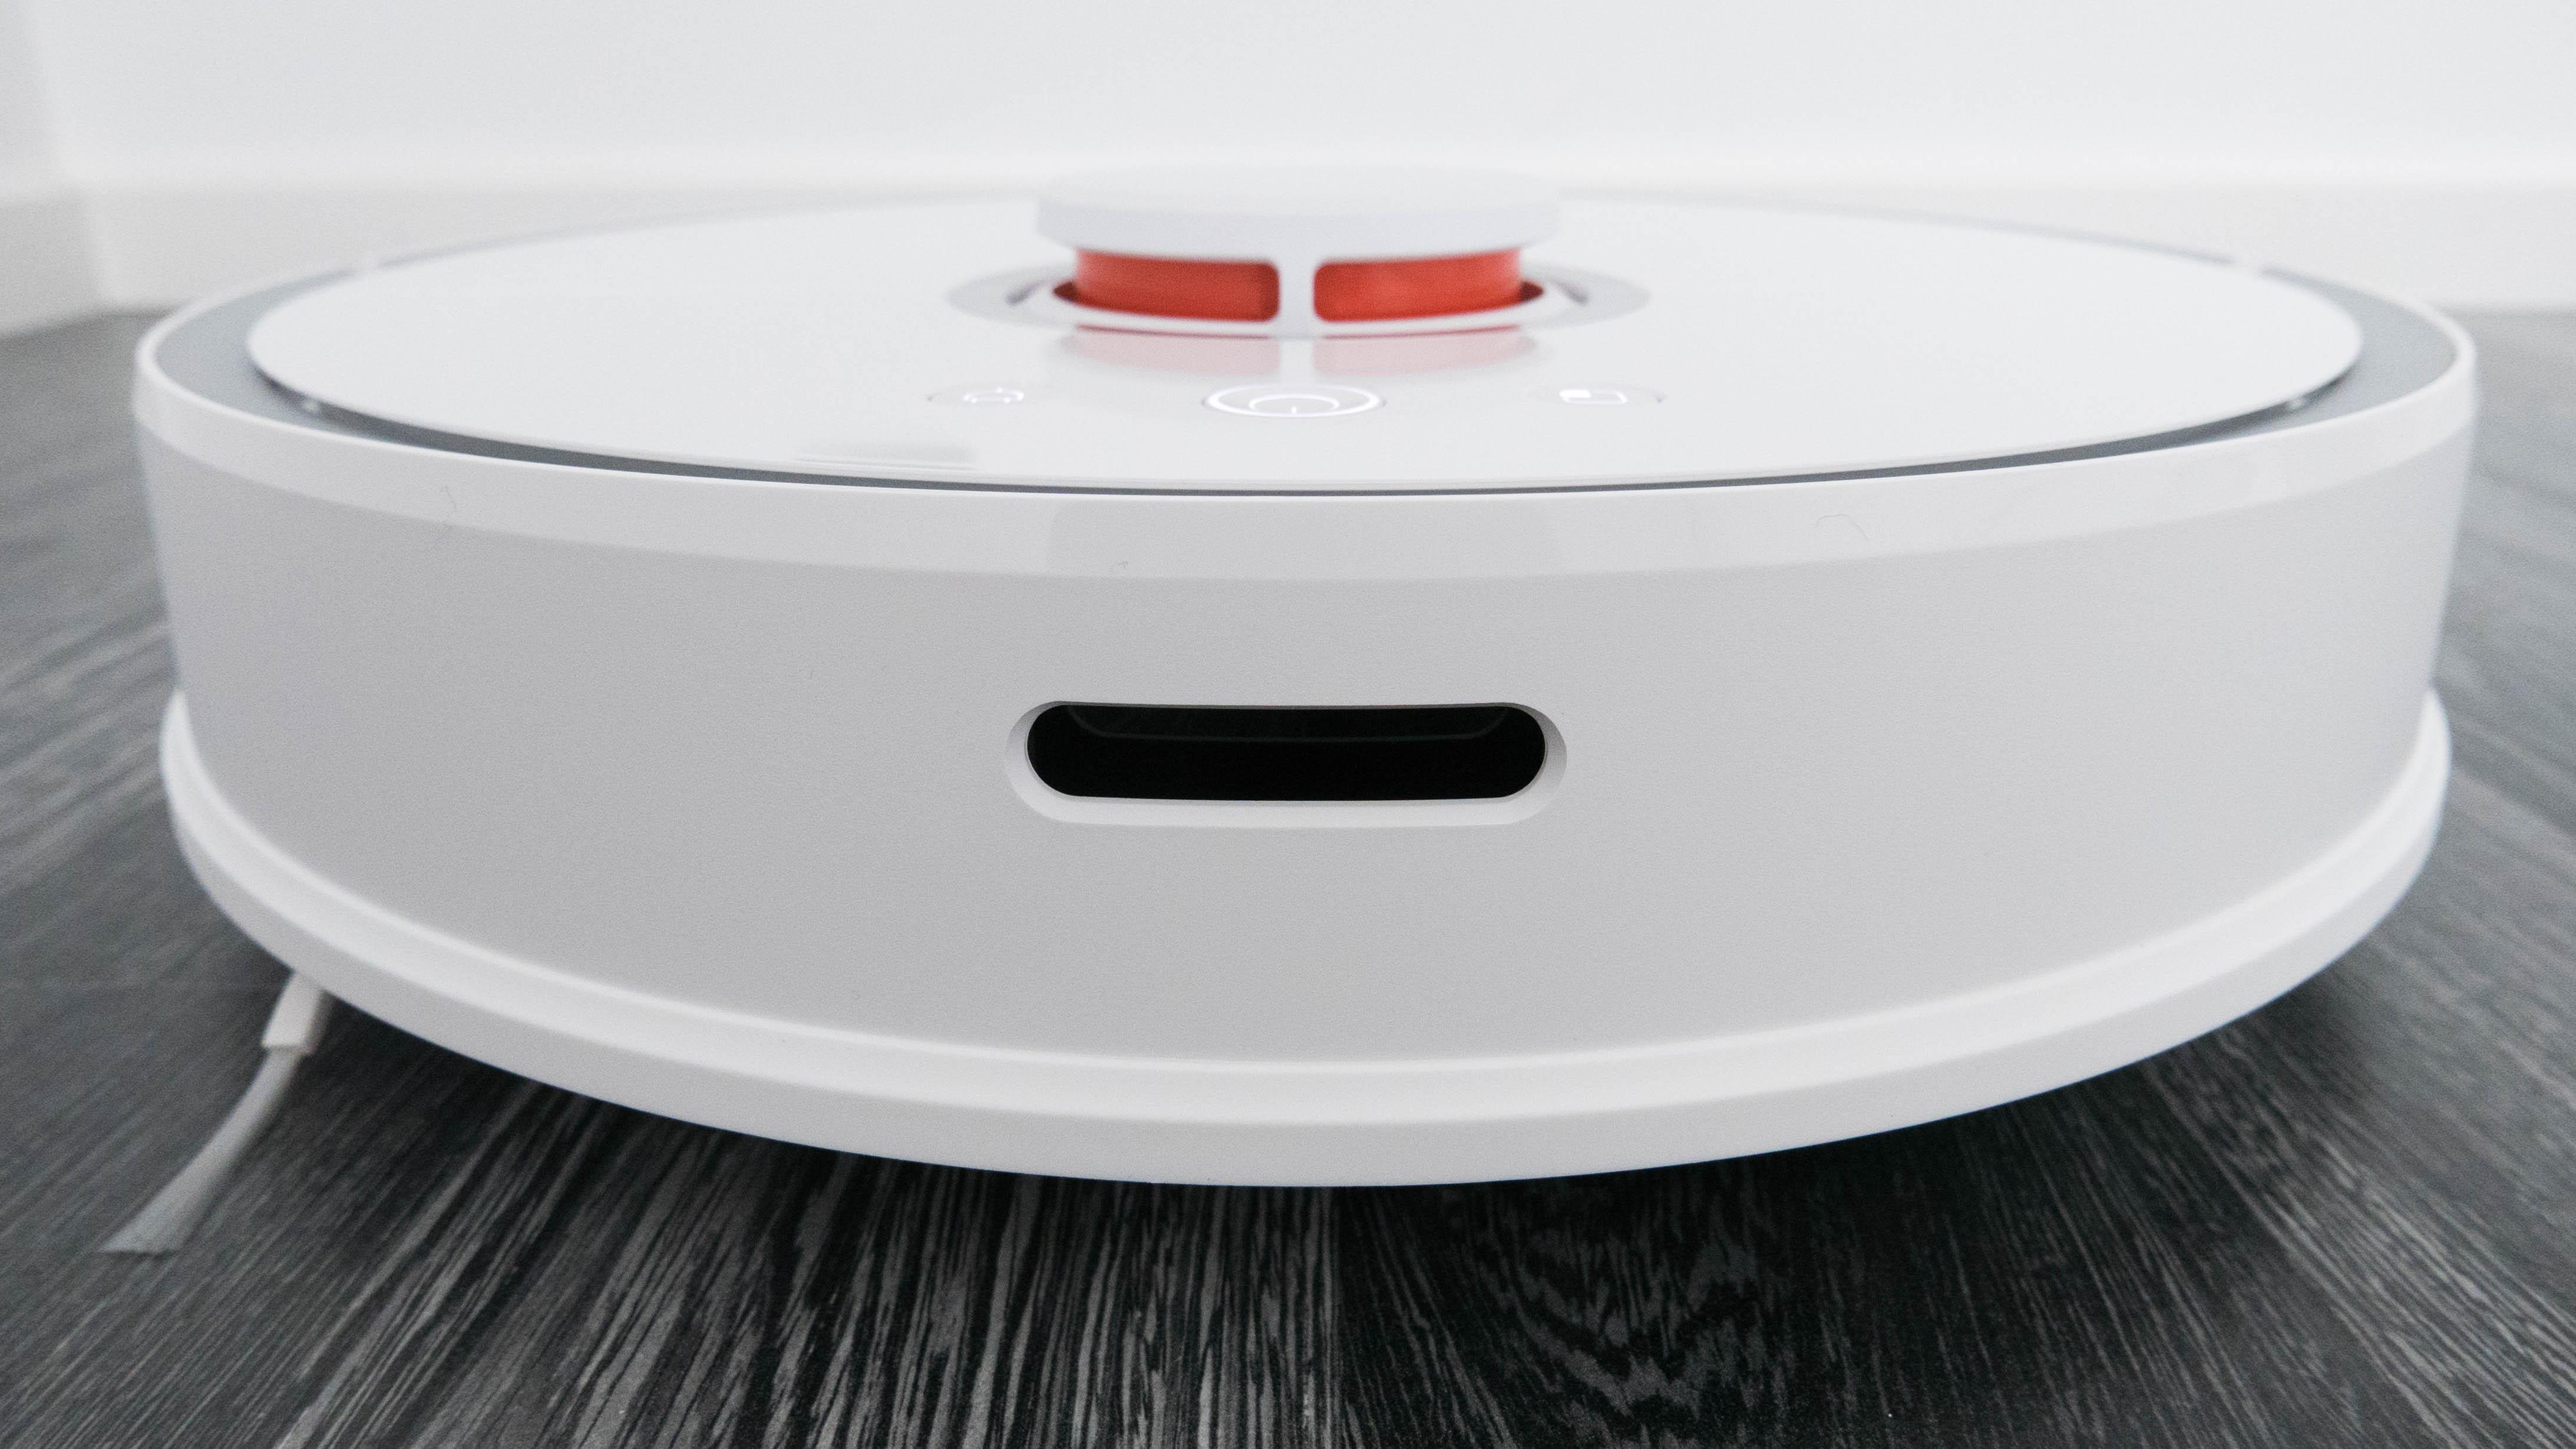 Xiaomi Mi Robot 2 Roborock S50 Roboter Details 16